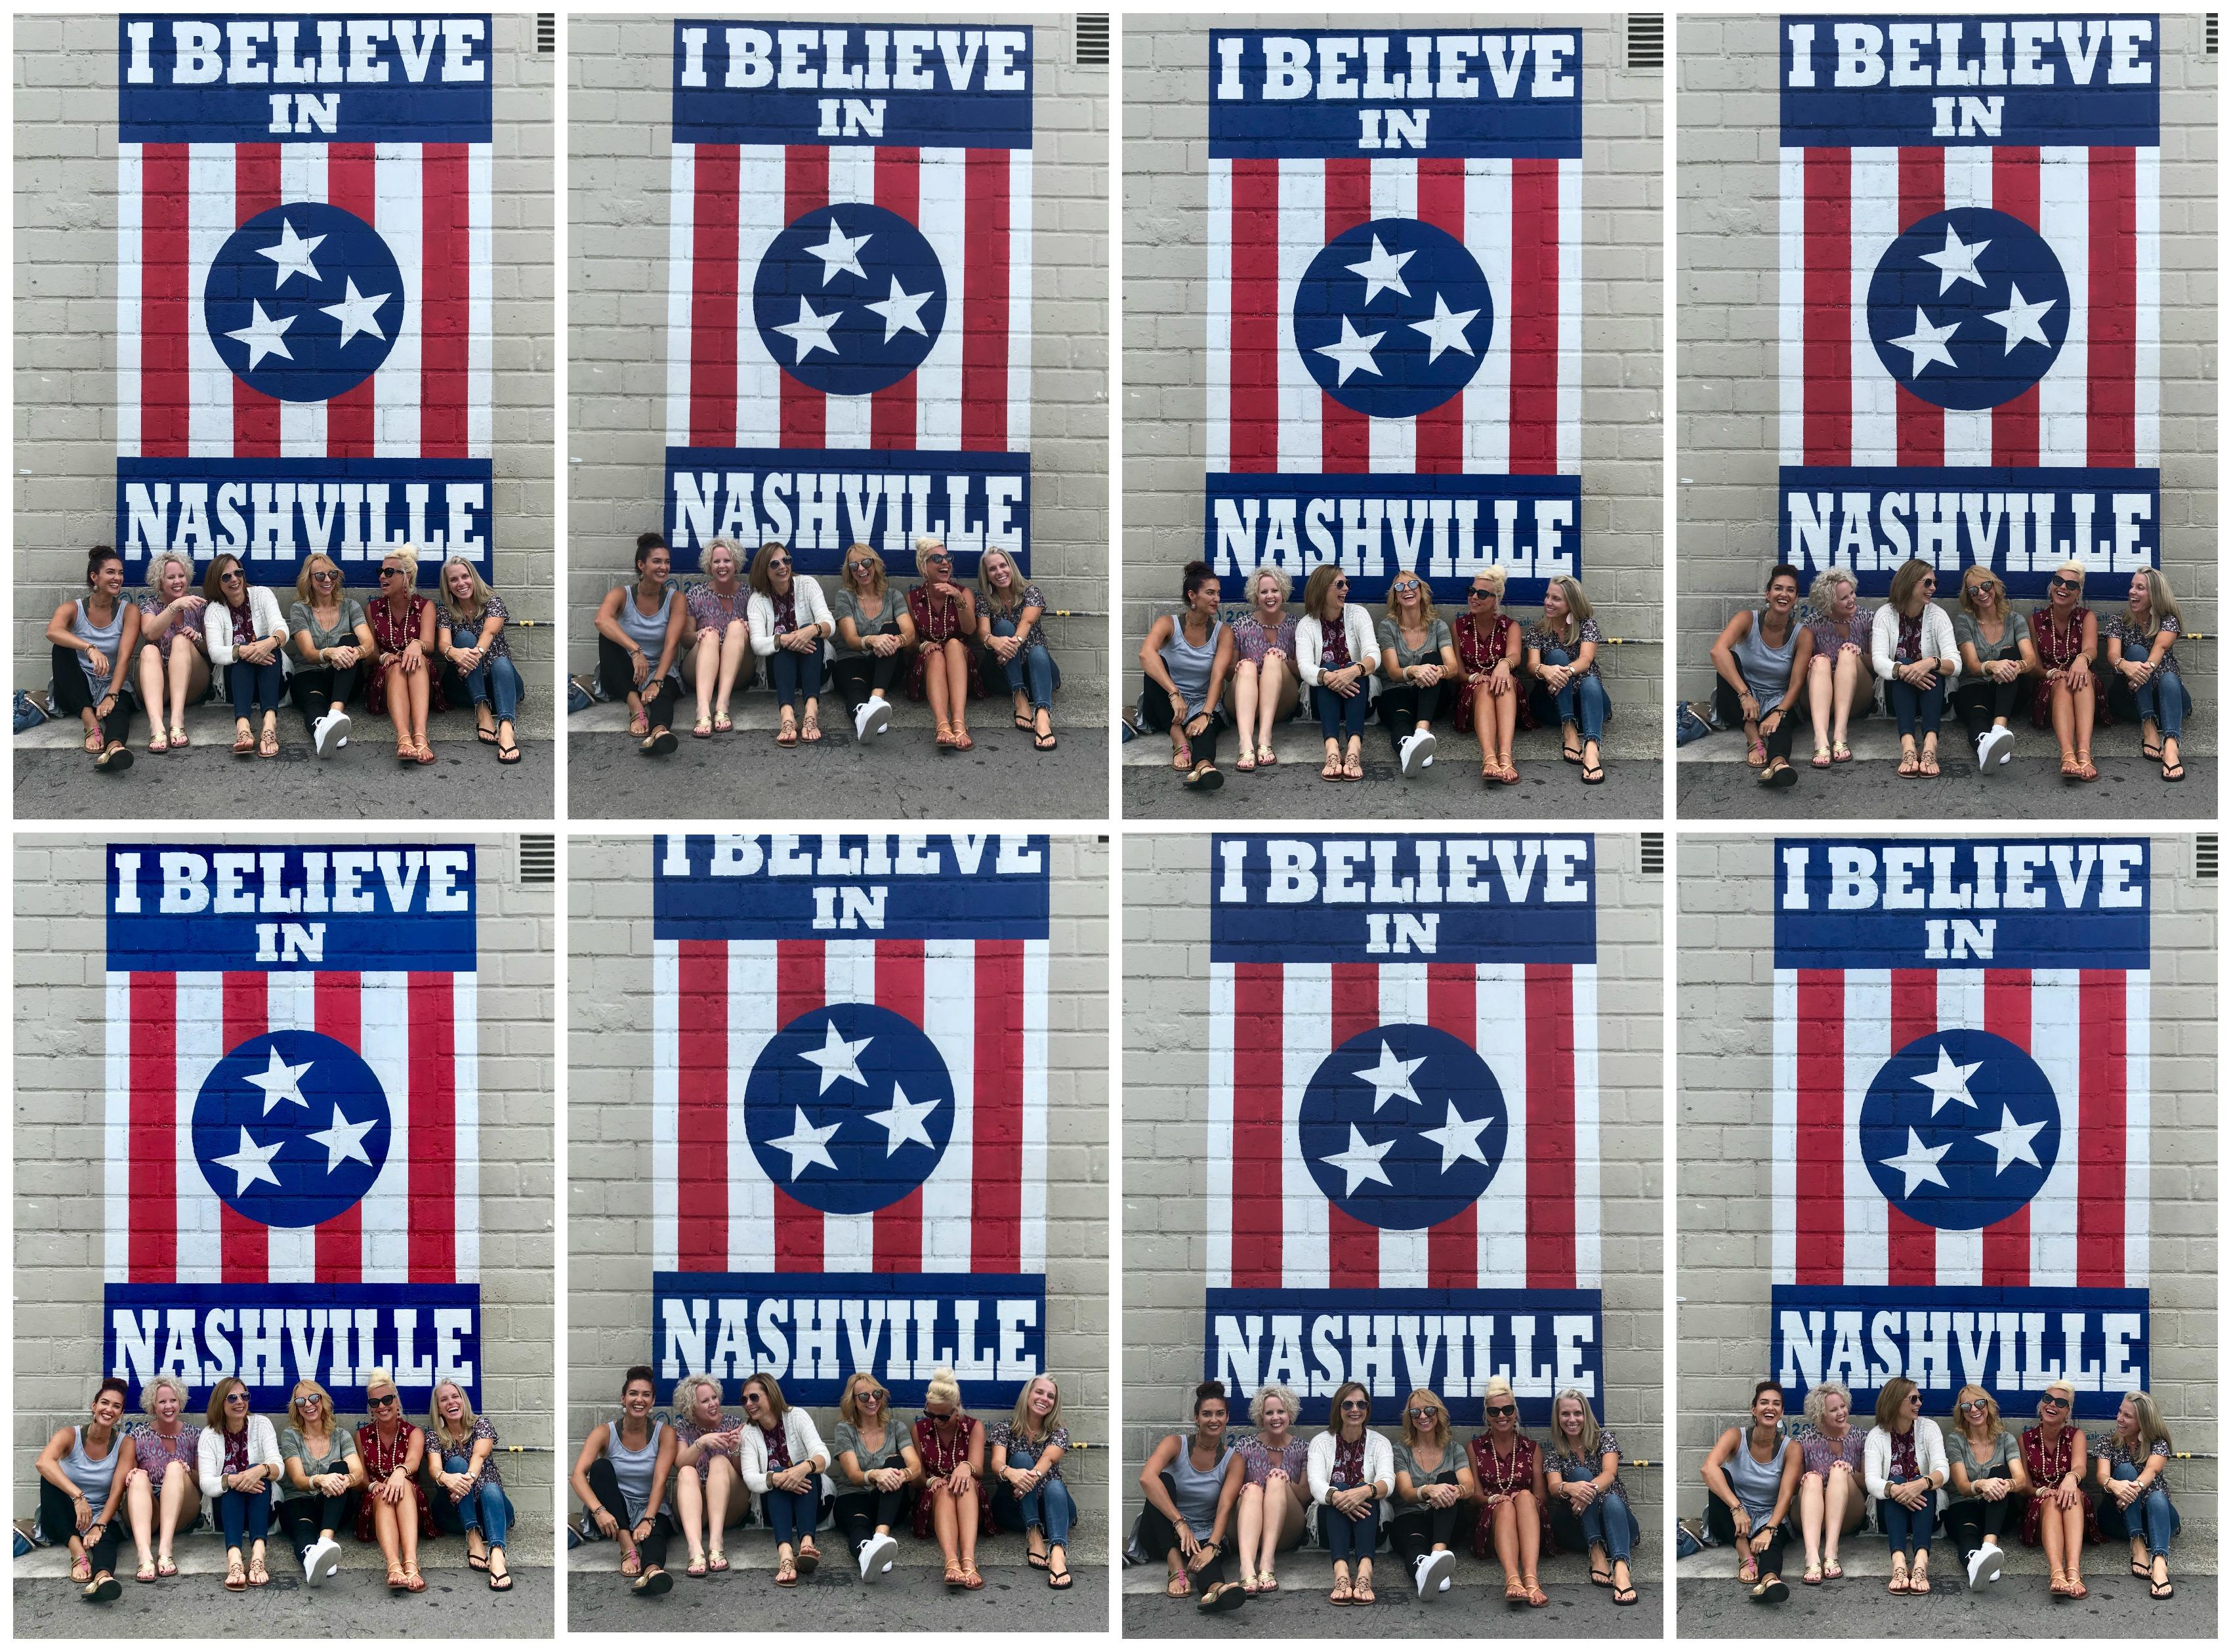 Nashville Murals, Bloggers, I believe in Nashville